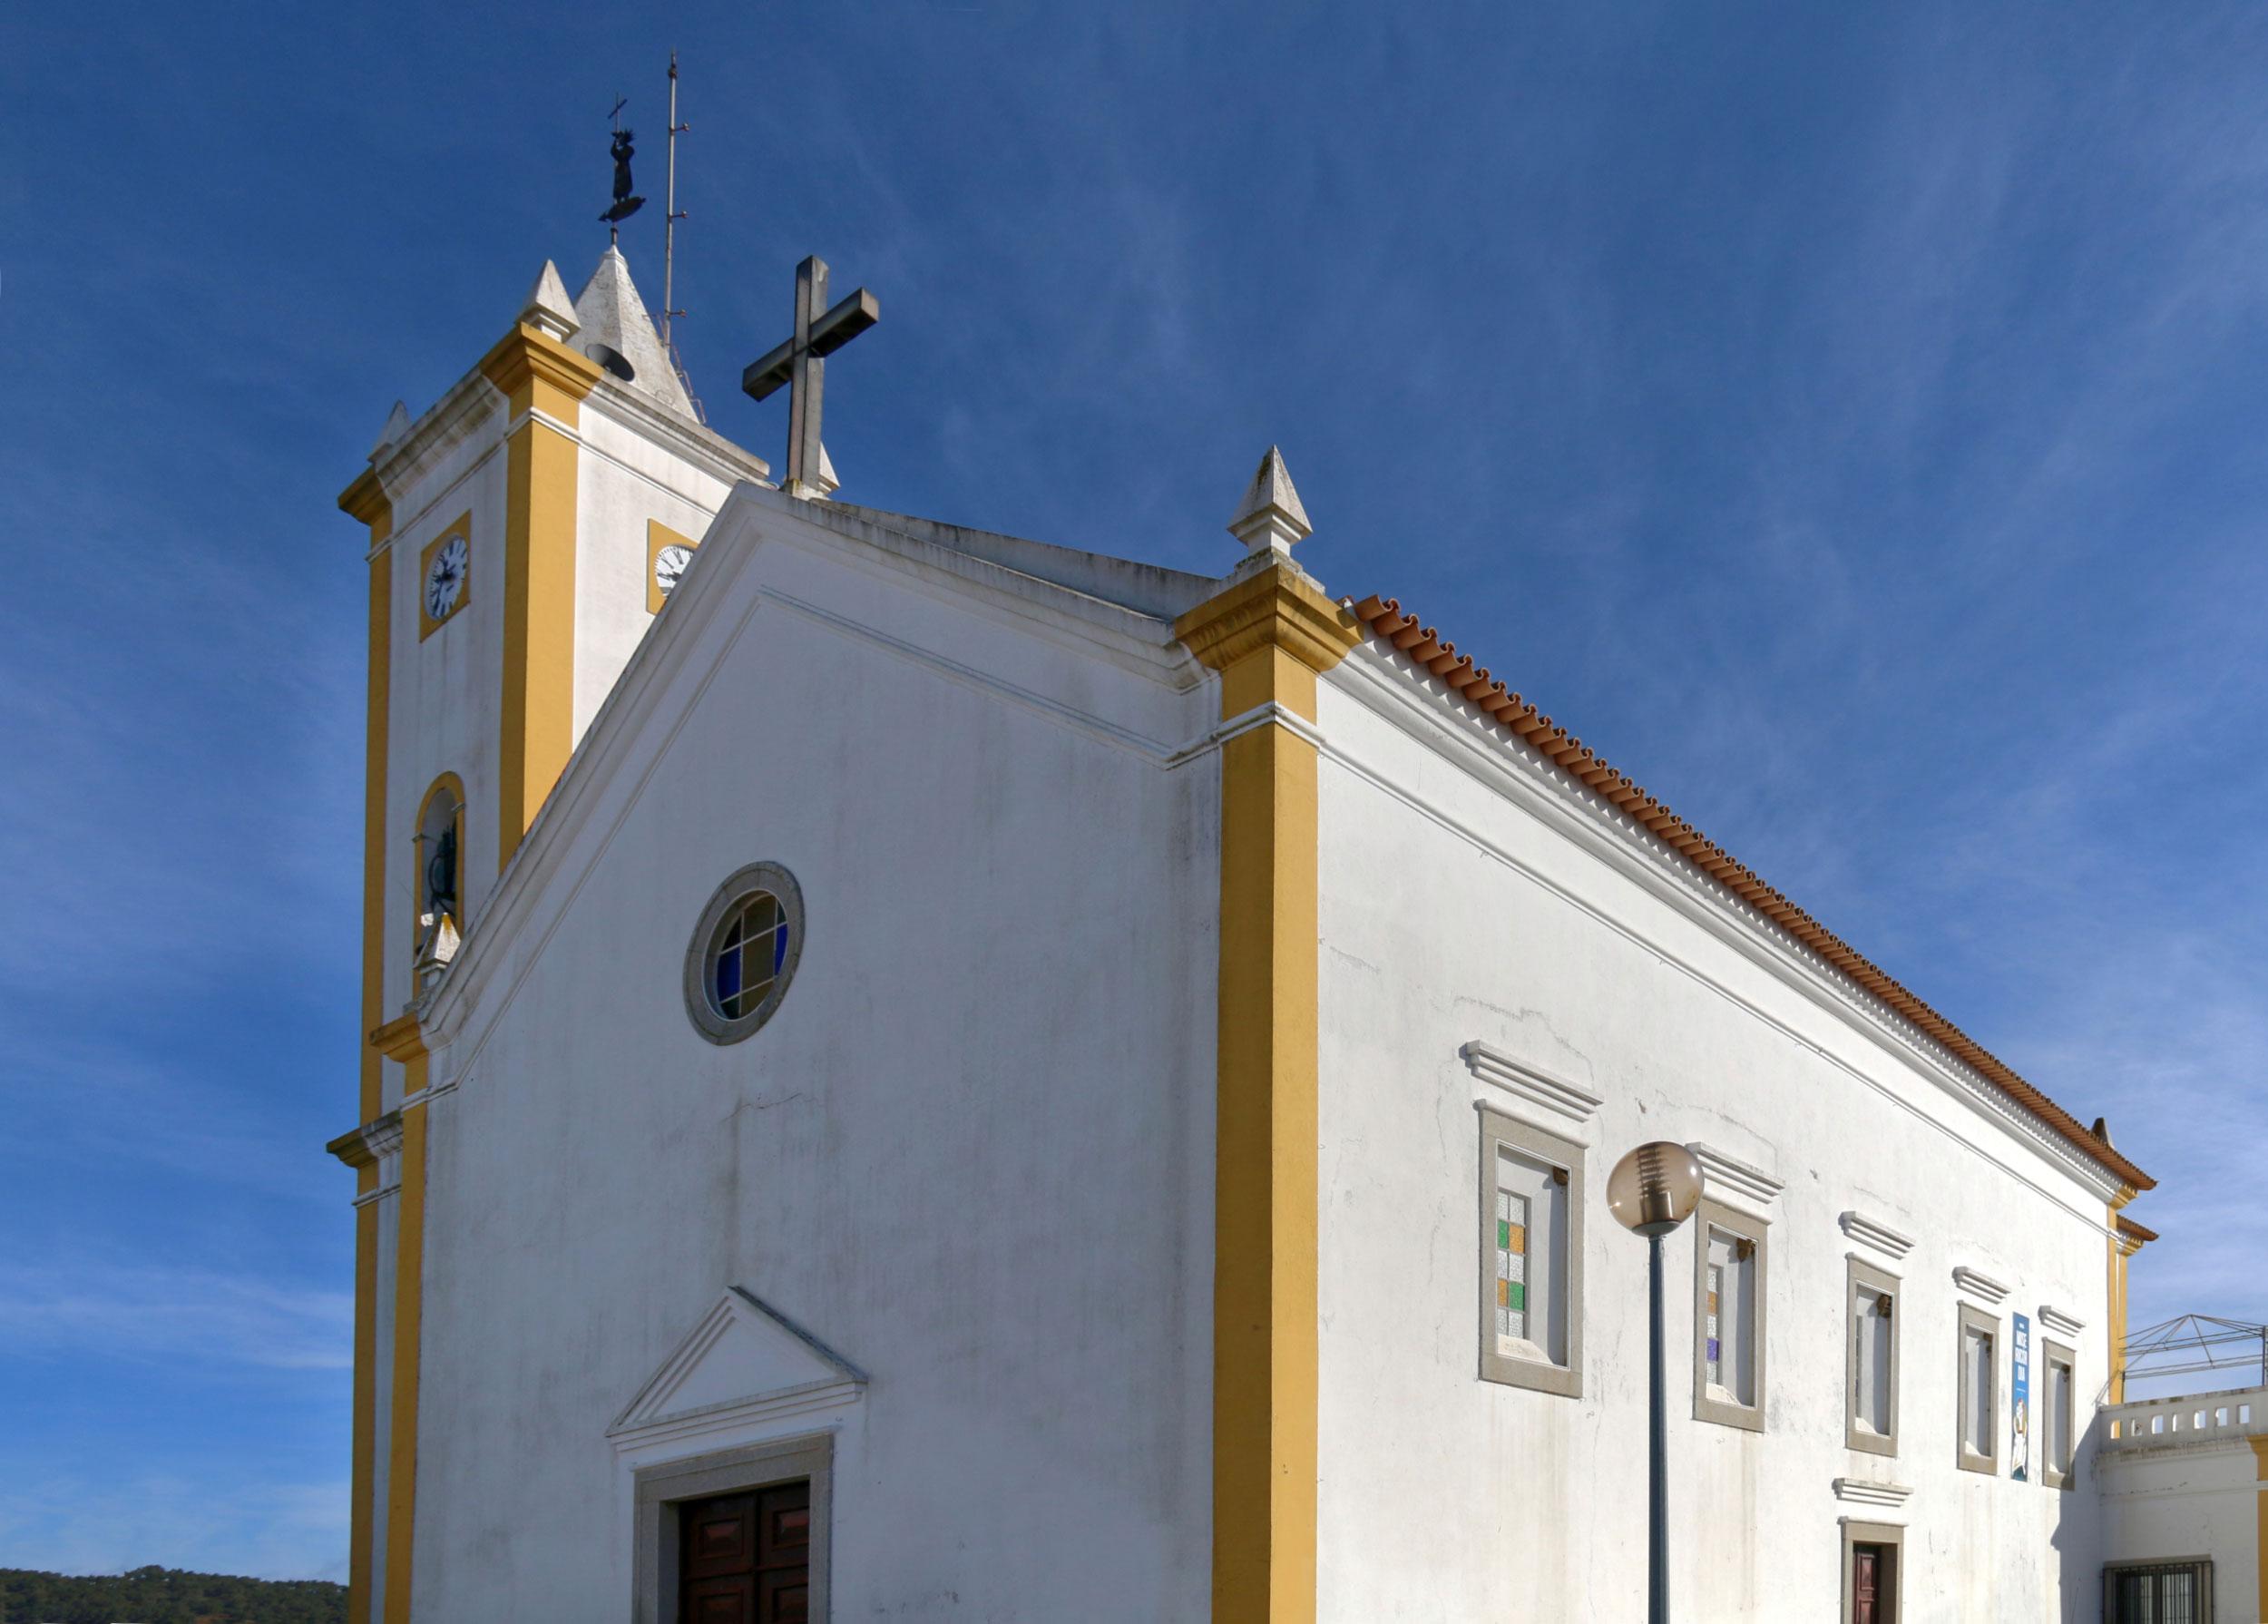 Igreja Paroquial do Escoural (CMMN, s/d)